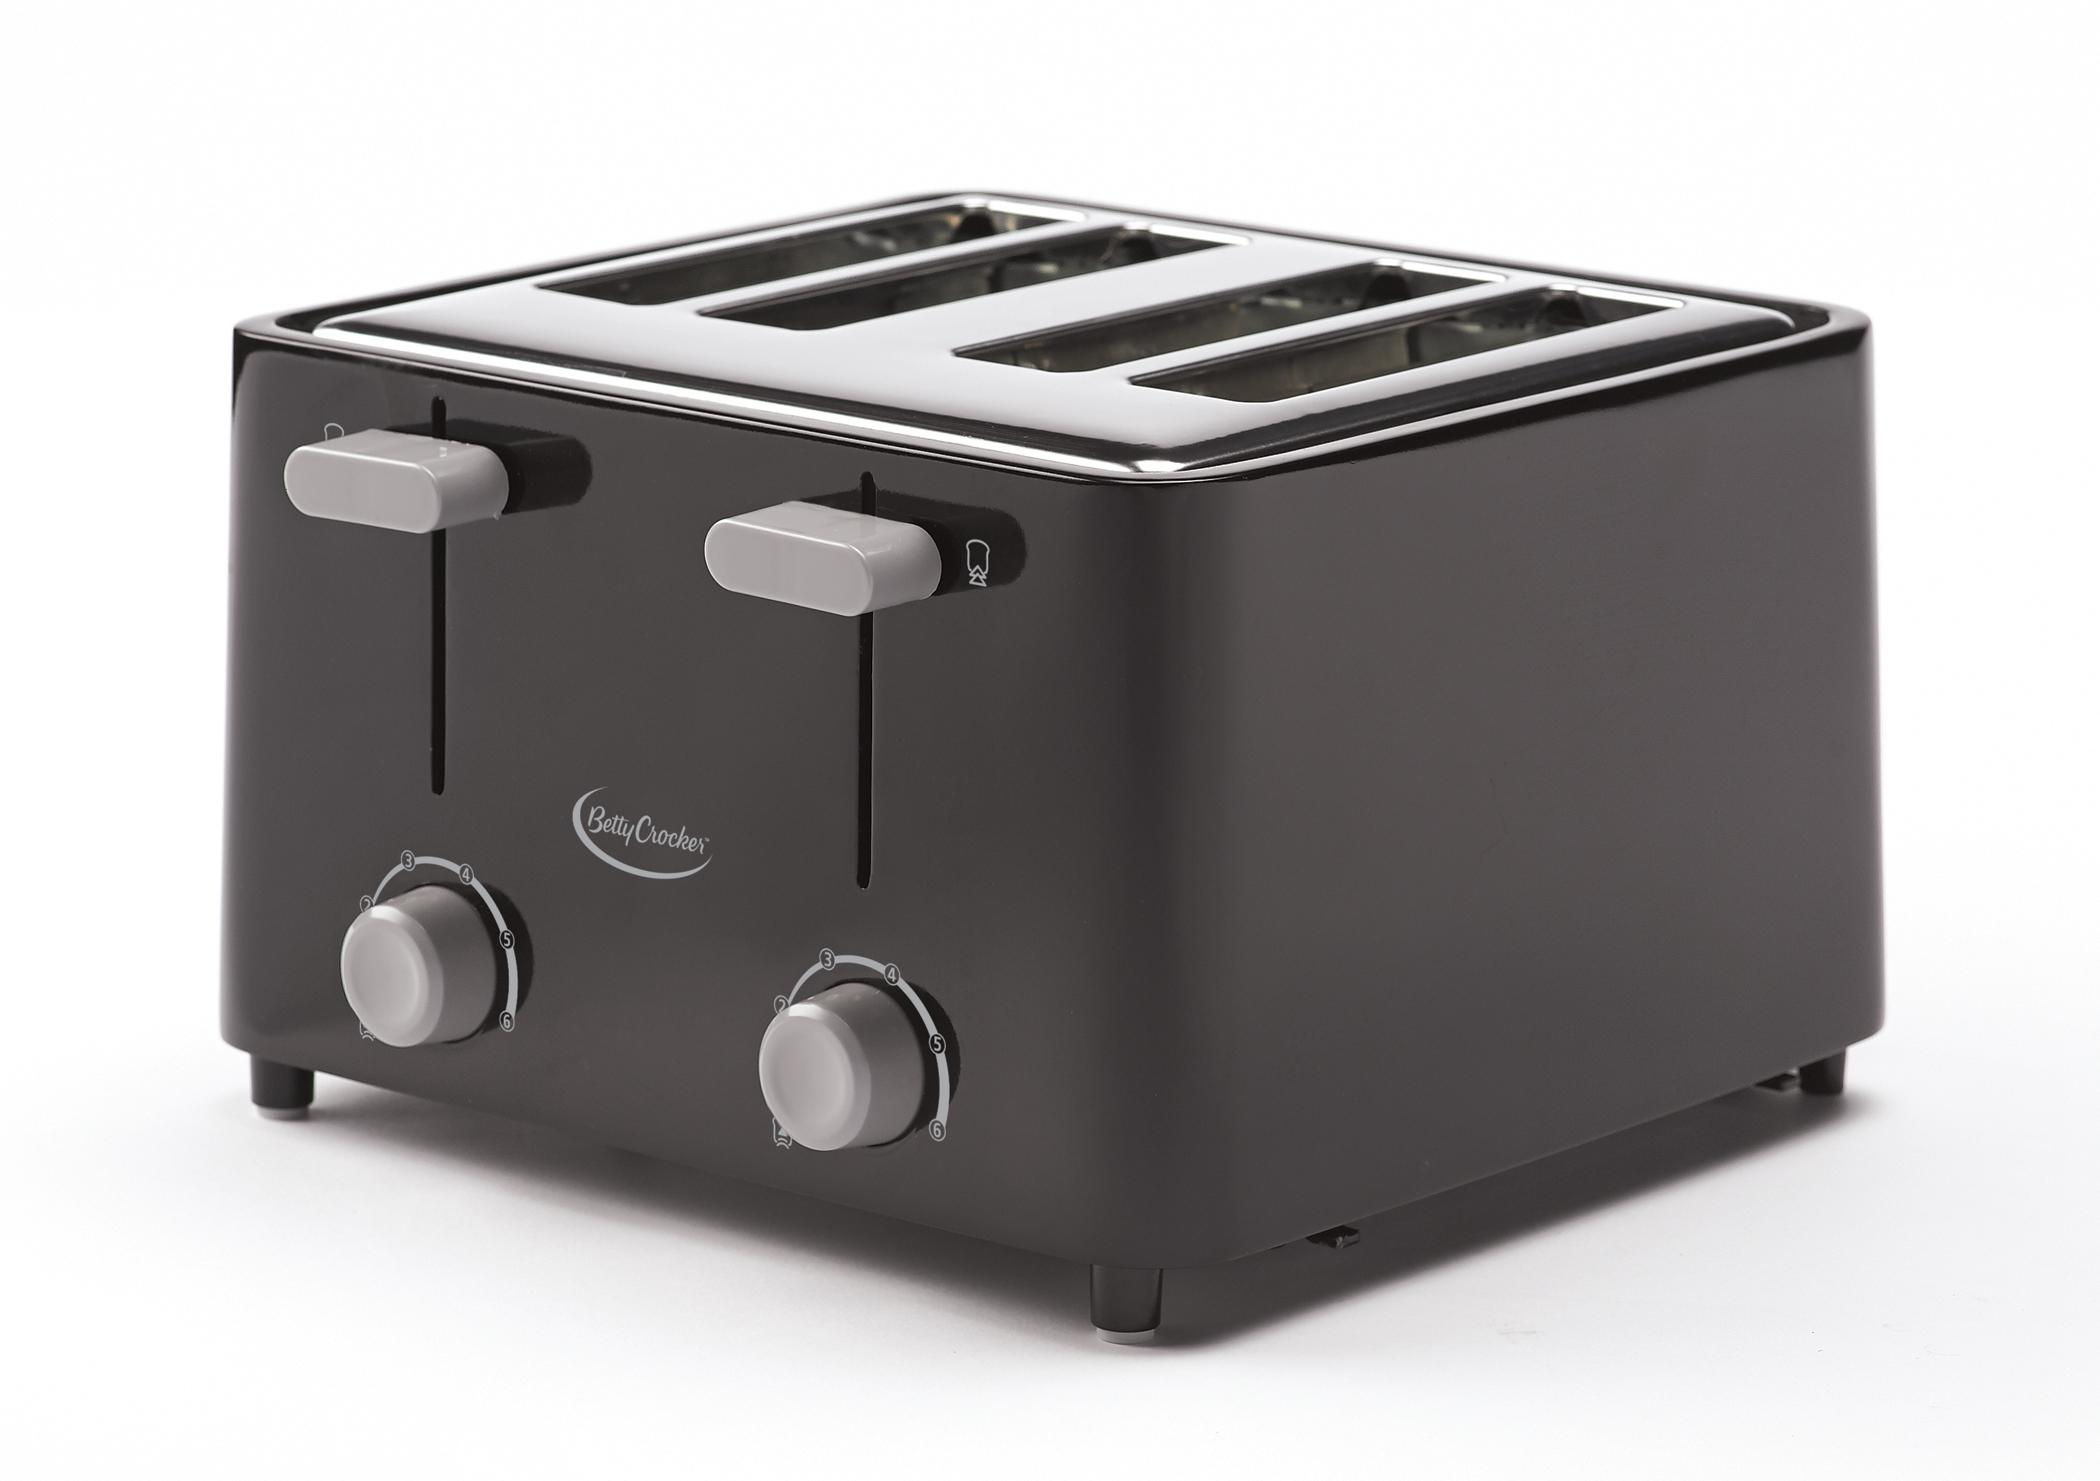 Betty Crocker Toaster Ovens Small Kitchen Appliances